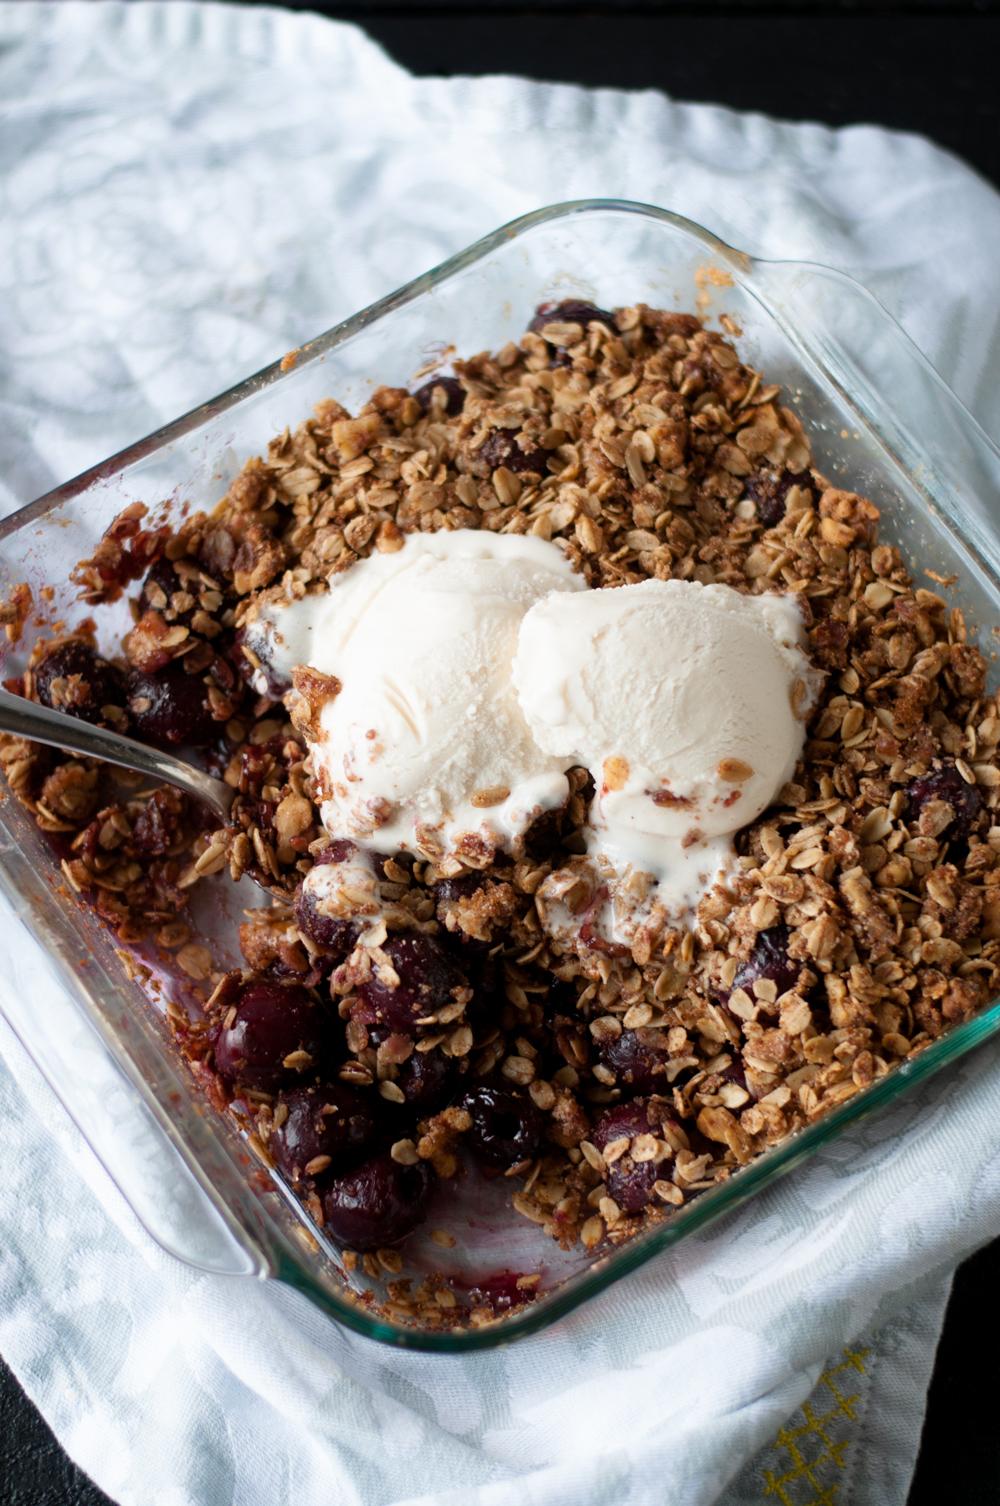 Vegan Cherry Crisp topped with ice cream is the perfect summer dessert. YUM!!! #vegan #dessert